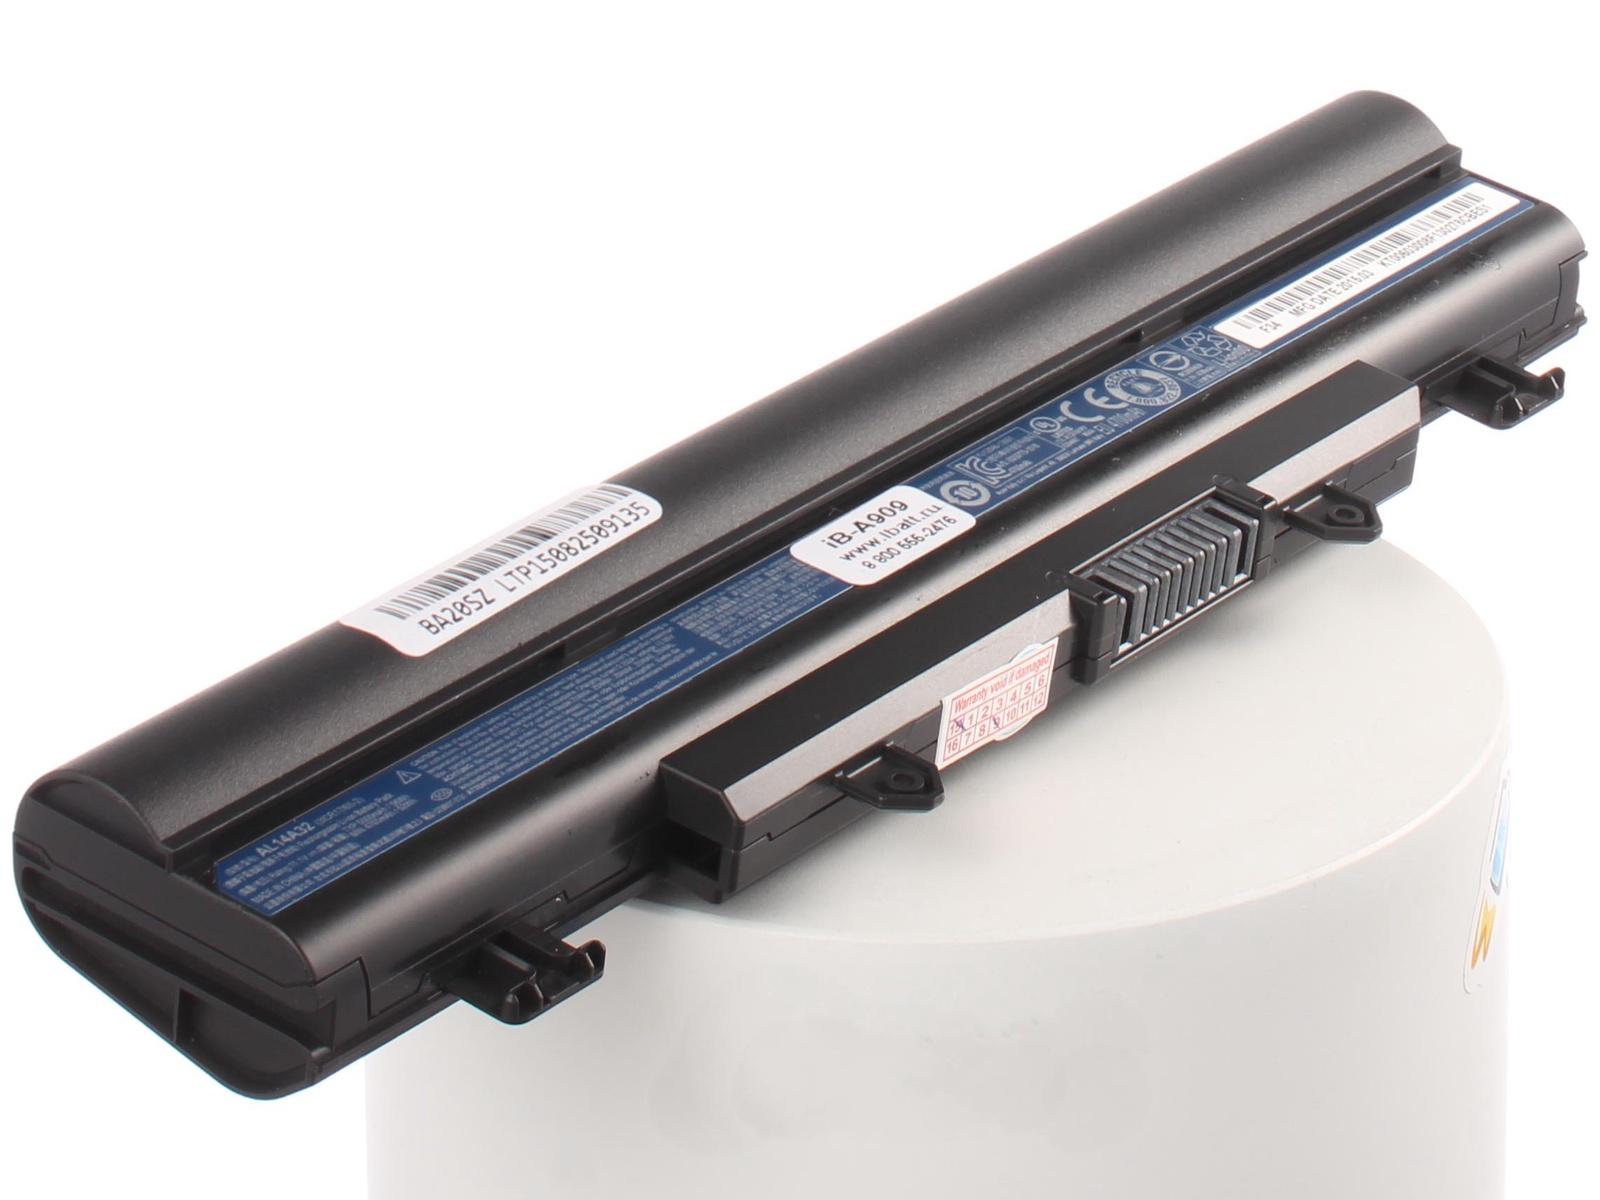 Аккумулятор для ноутбука iBatt для Acer Aspire E5-572G-54VN, Aspire V3-572P, Aspire E5-471G, ASPIRE E5-511-C9BT, ASPIRE E5-511-P7KL, Aspire E5-511-P7VU, Aspire E5-521-45Q4, Aspire E5-571G-347W, Aspire E5-571G-36SG ноутбук acer aspire e5 576g 31sj nx gvber 031